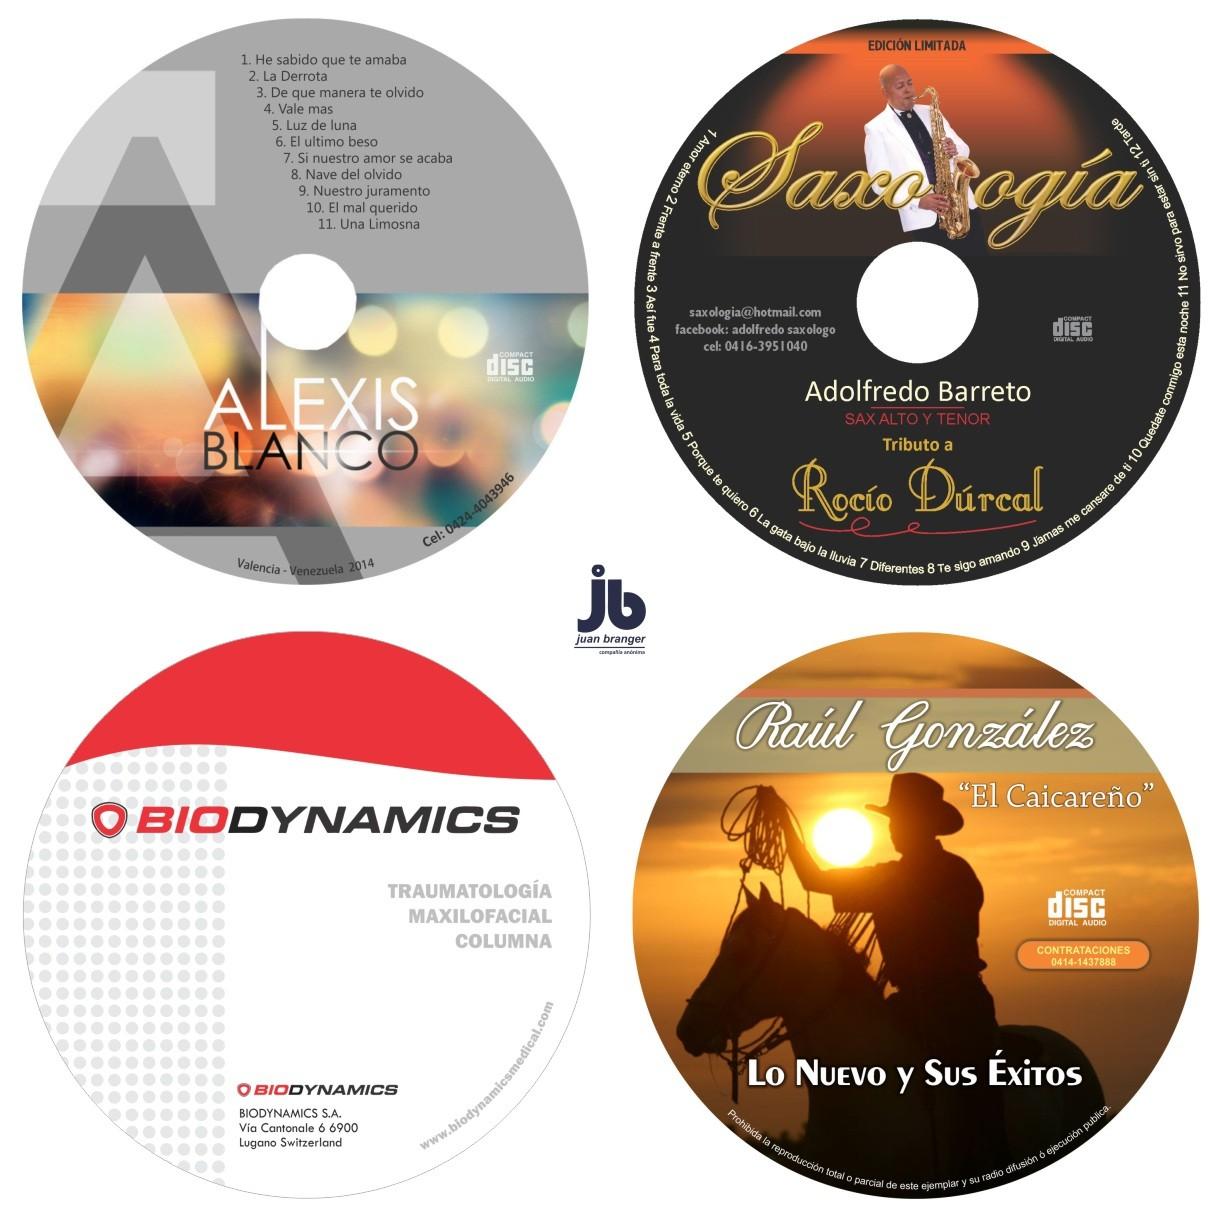 impresion de cd dvd